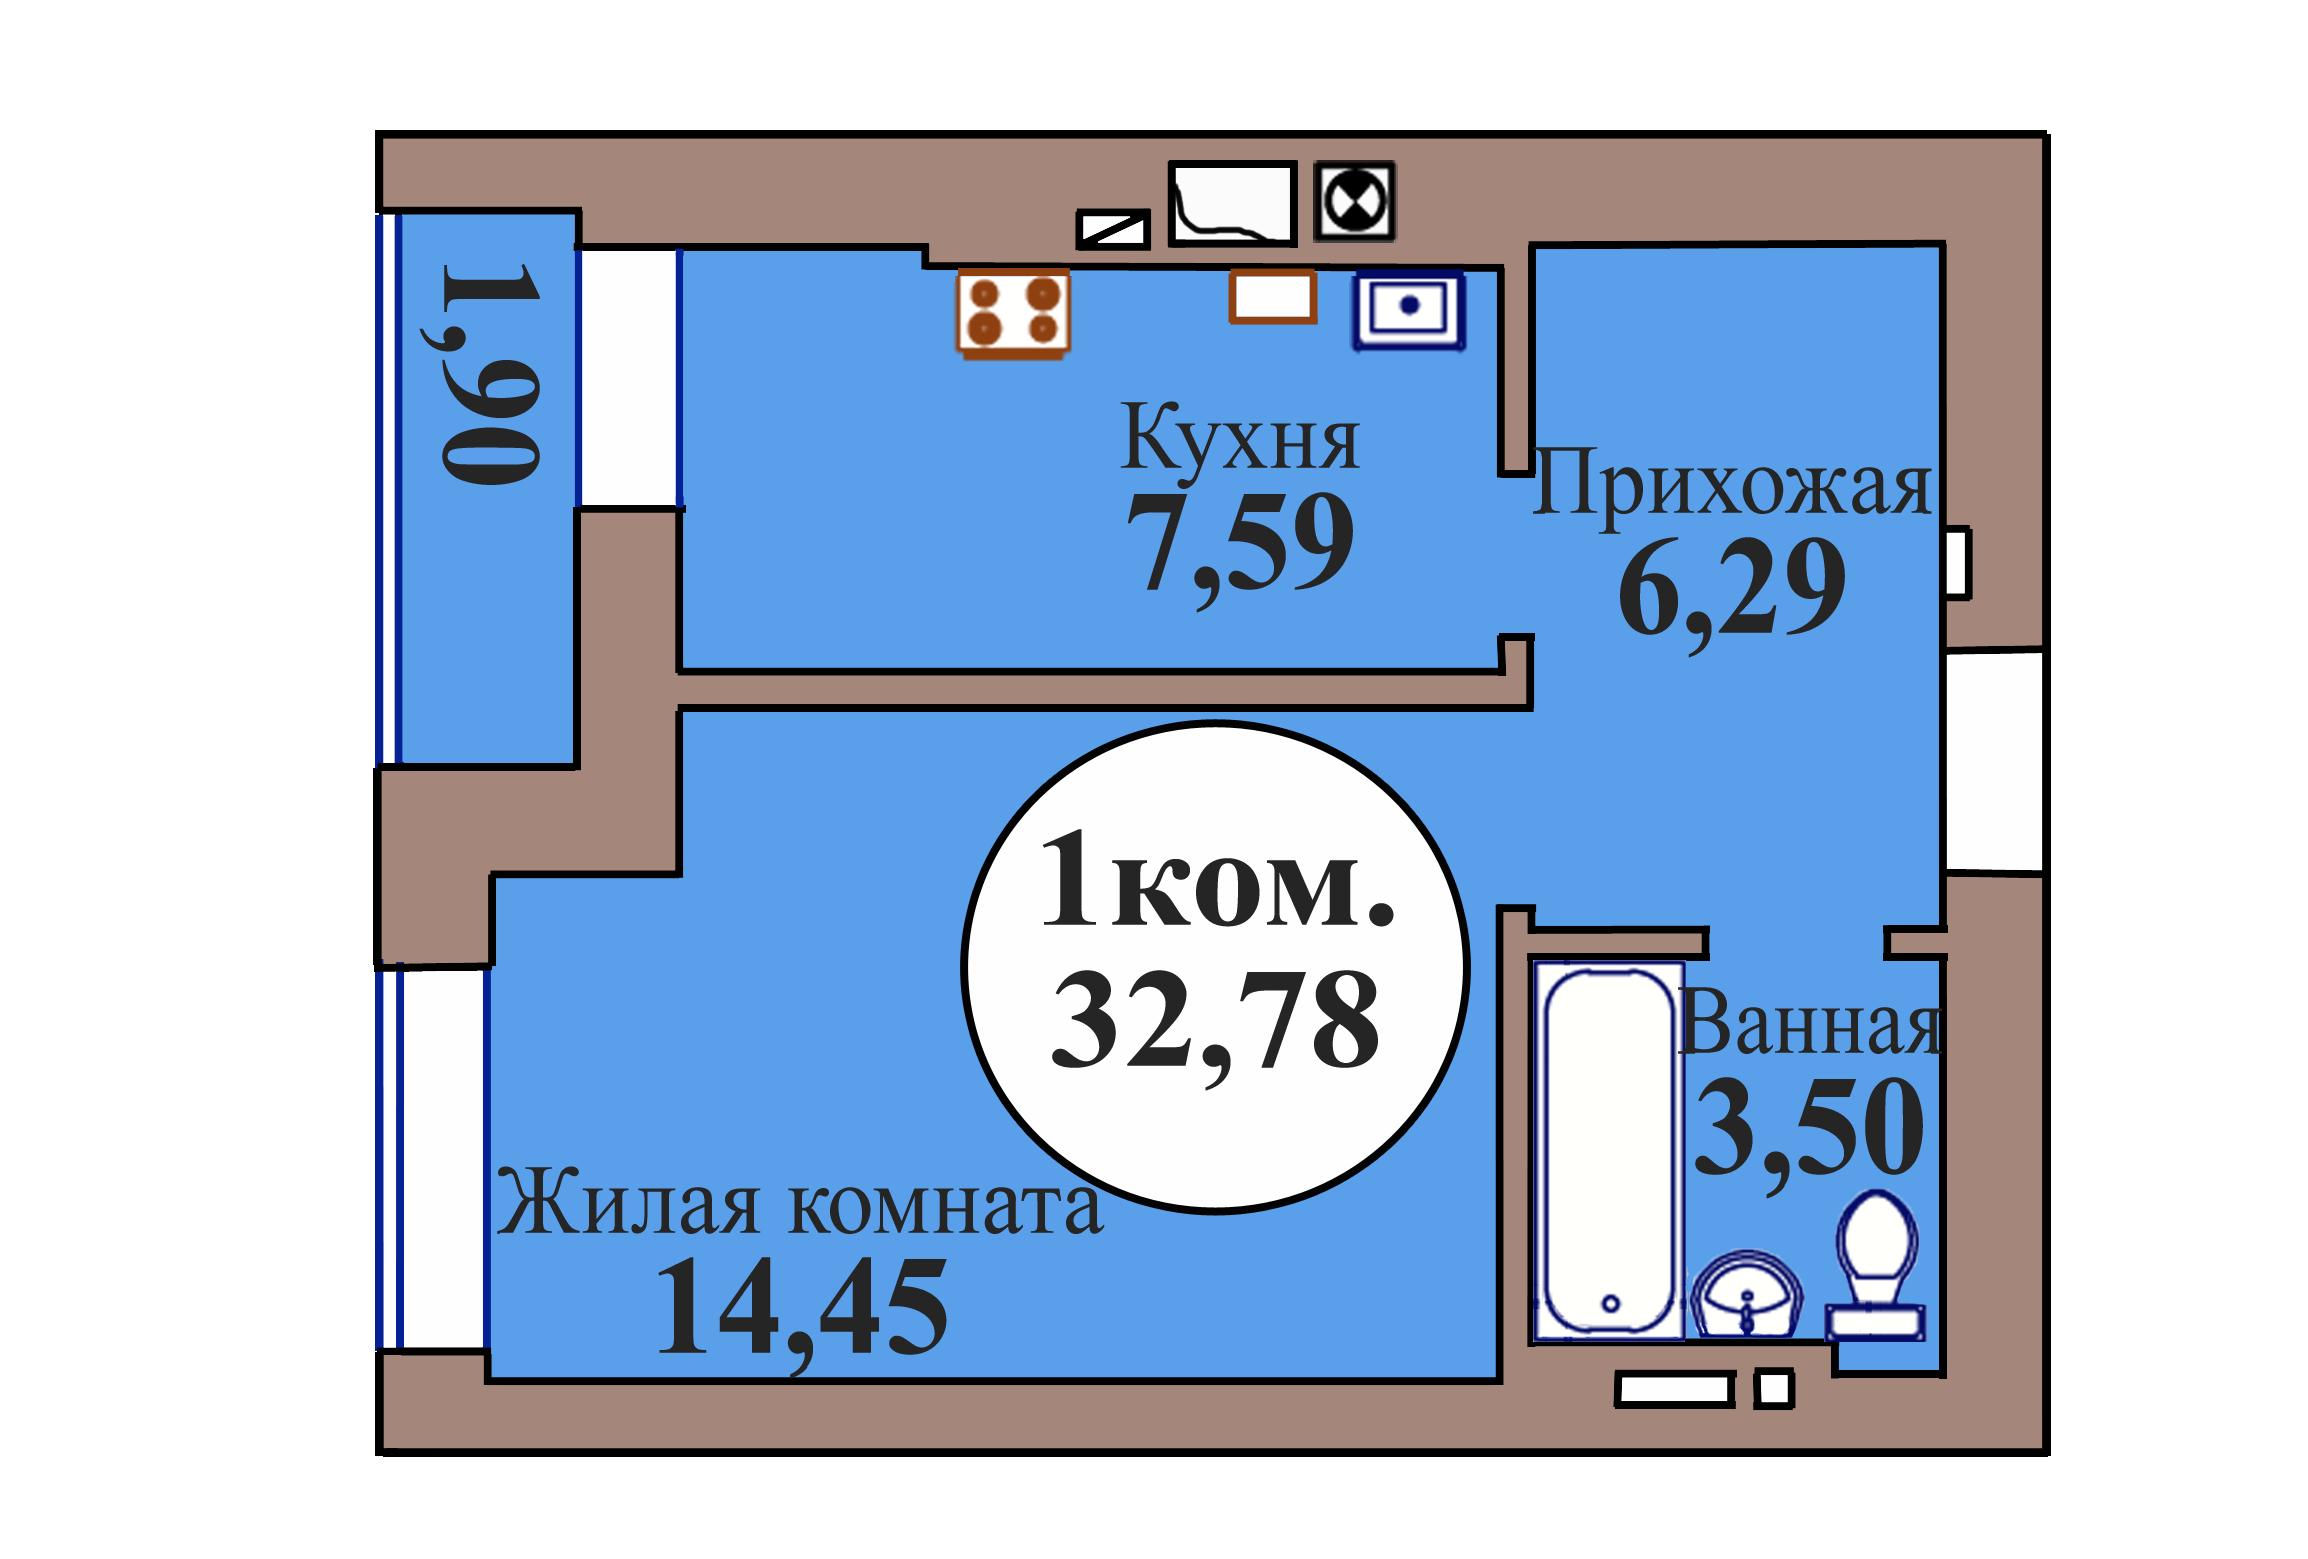 1-комн. кв. по пер. Калининградский, 5 кв. 78 в Калининграде